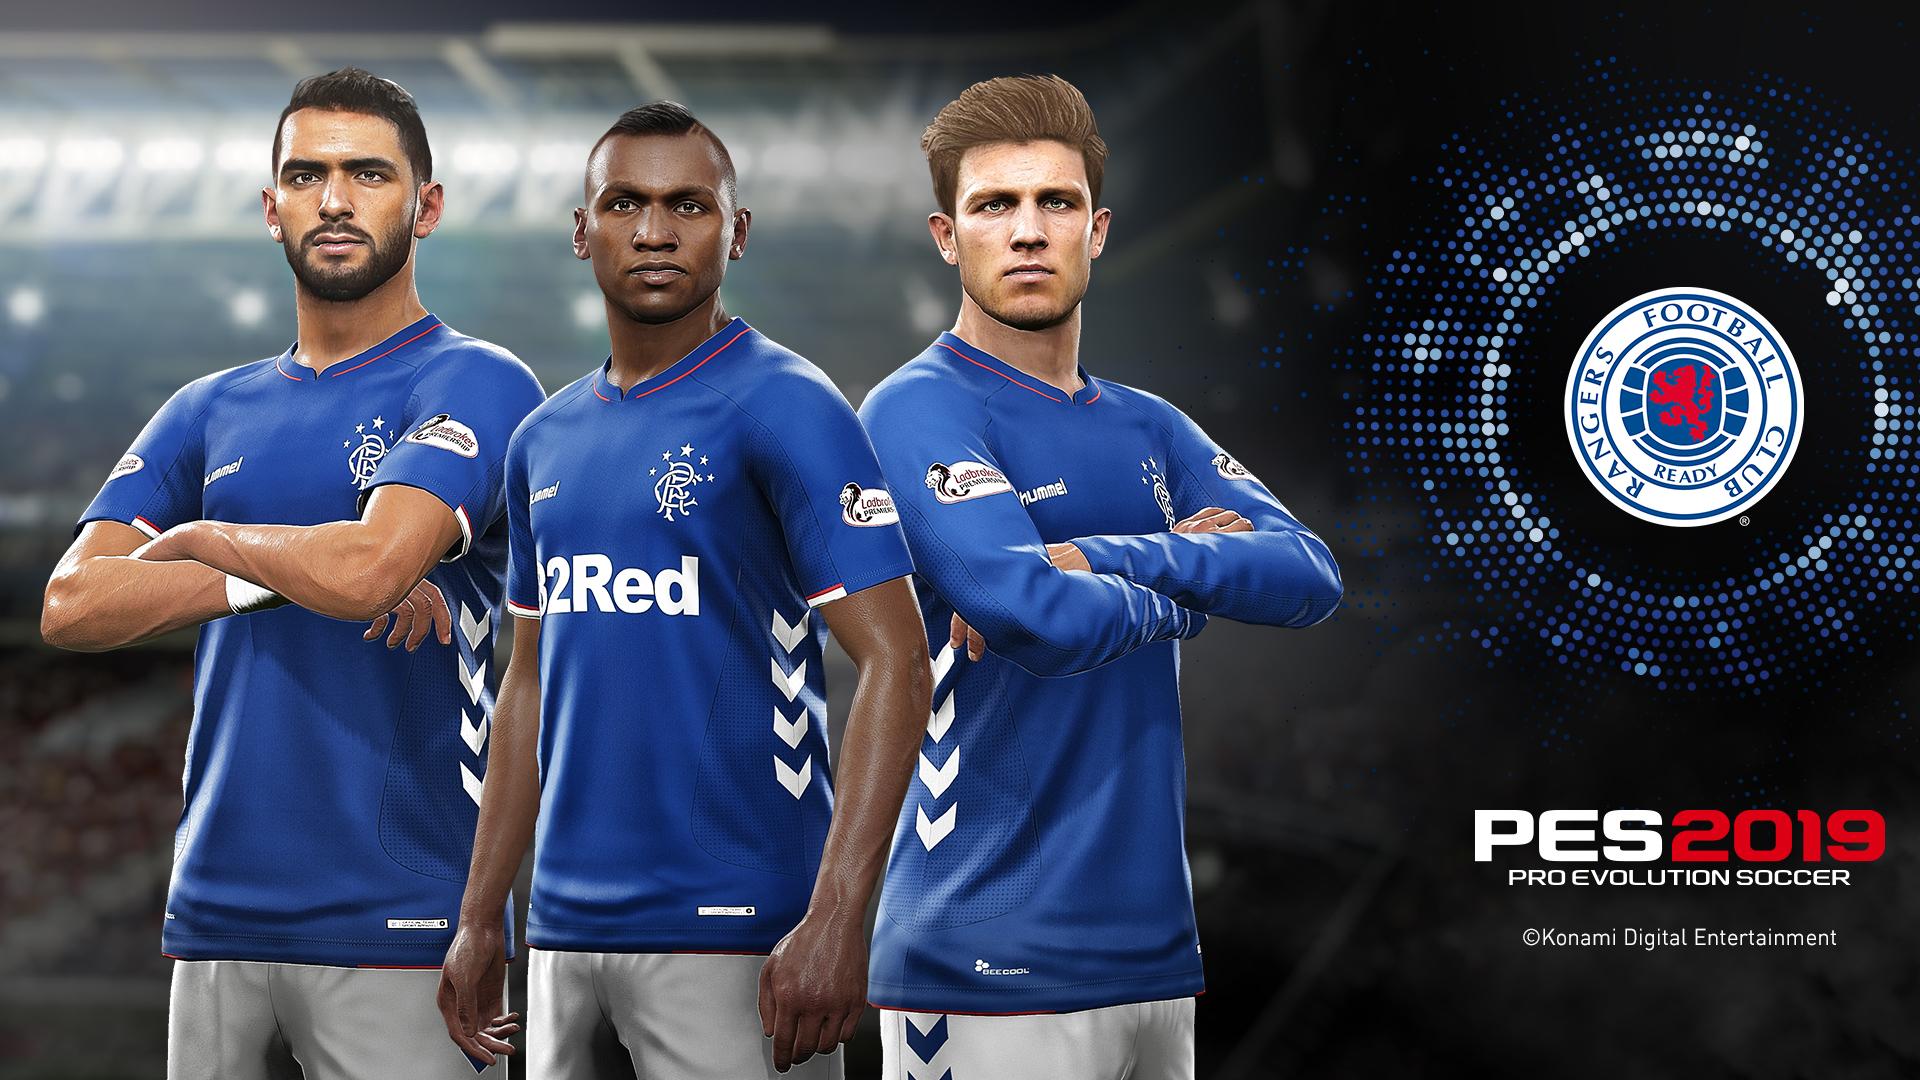 Rangers Announced As New PES 2019 Partner Club - Rangers